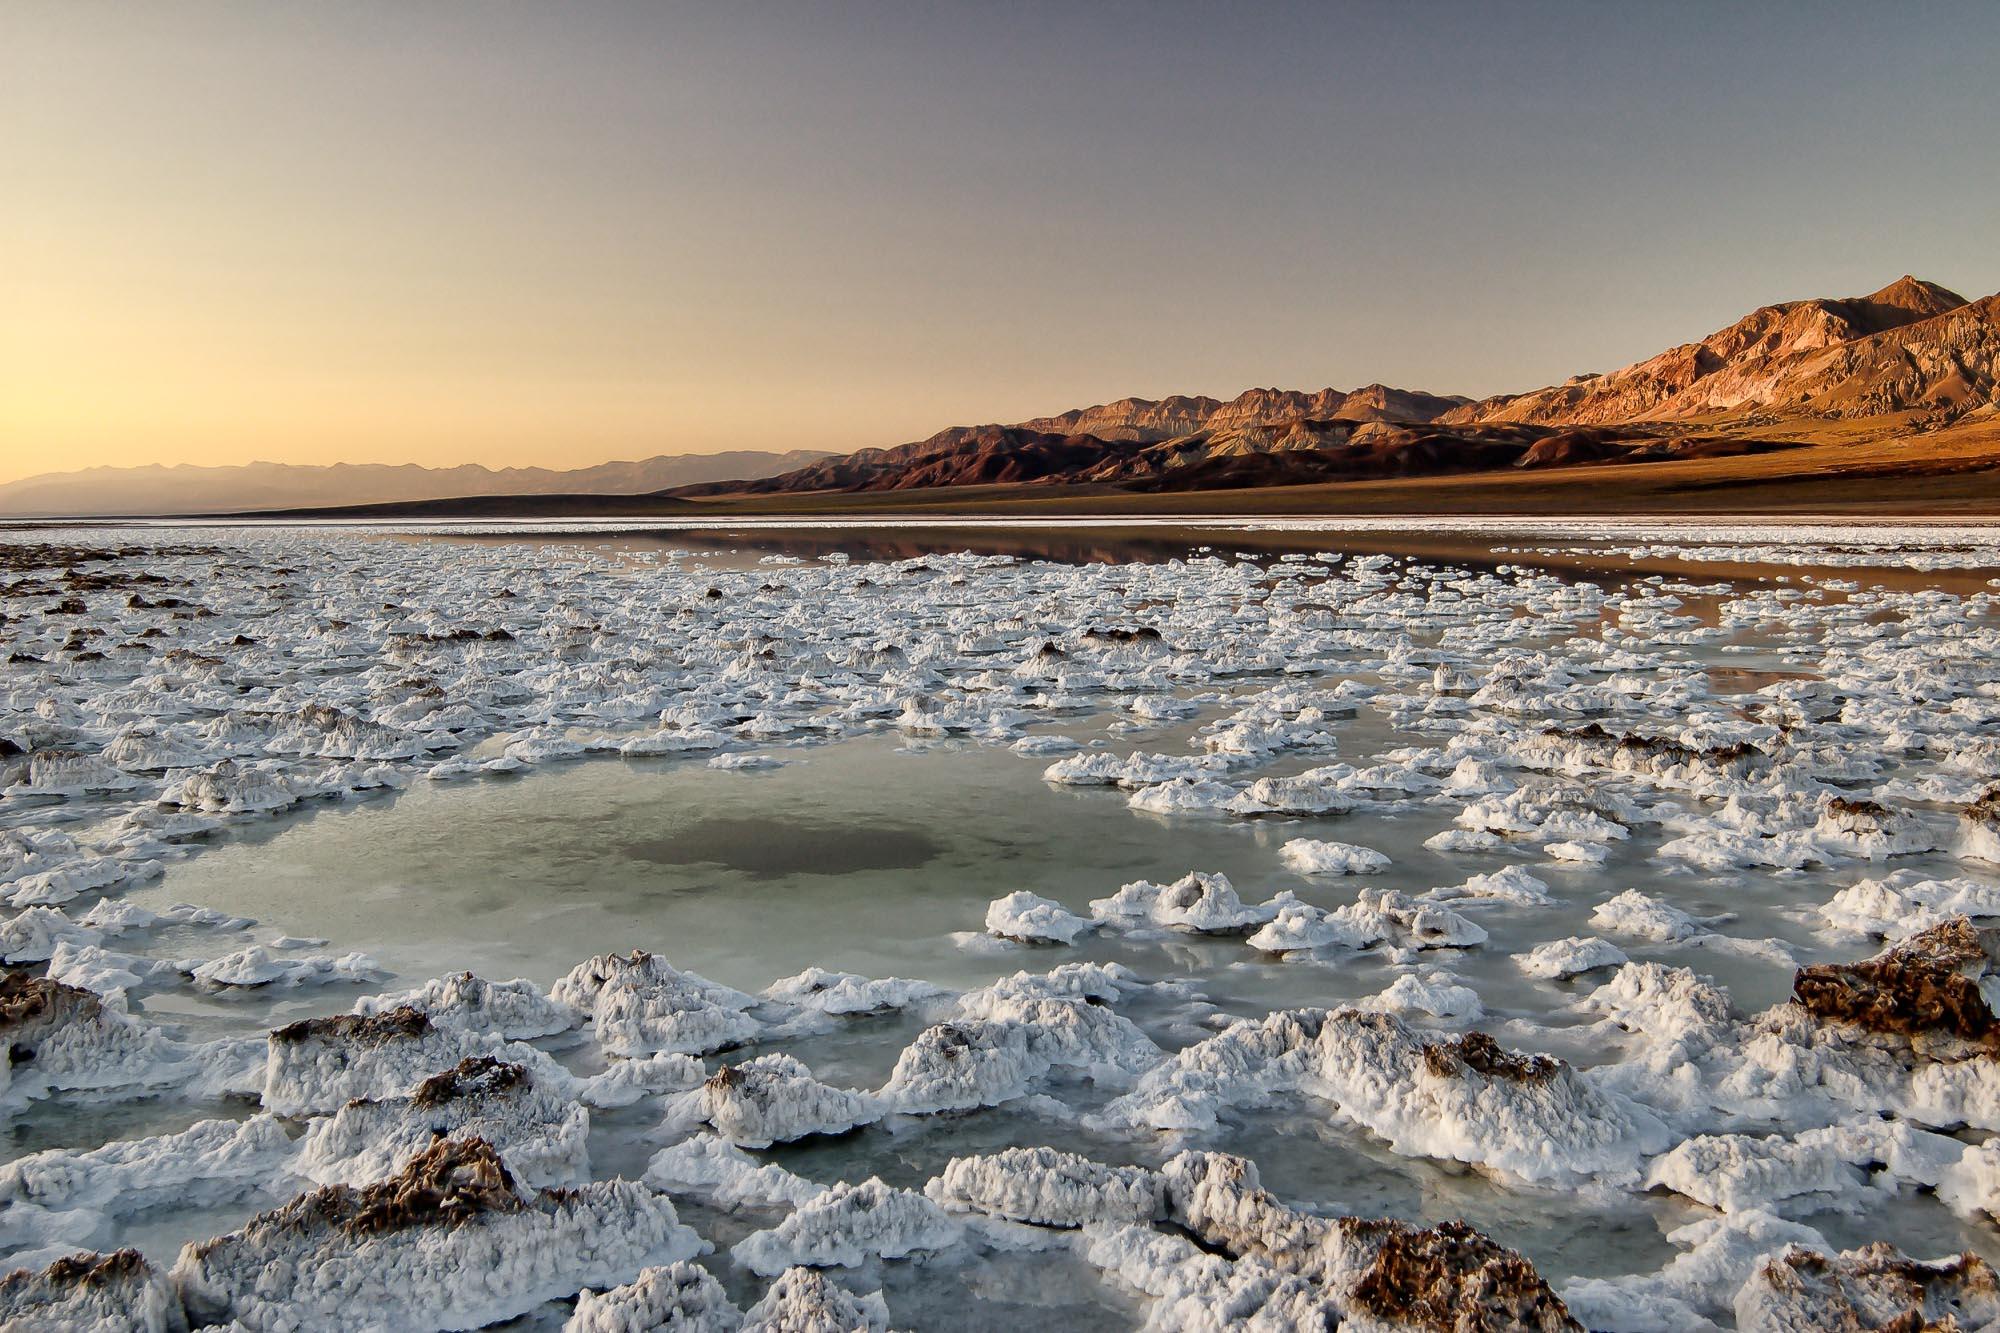 Salt in the Devil's Golf Course: Death Valley National Park 2005